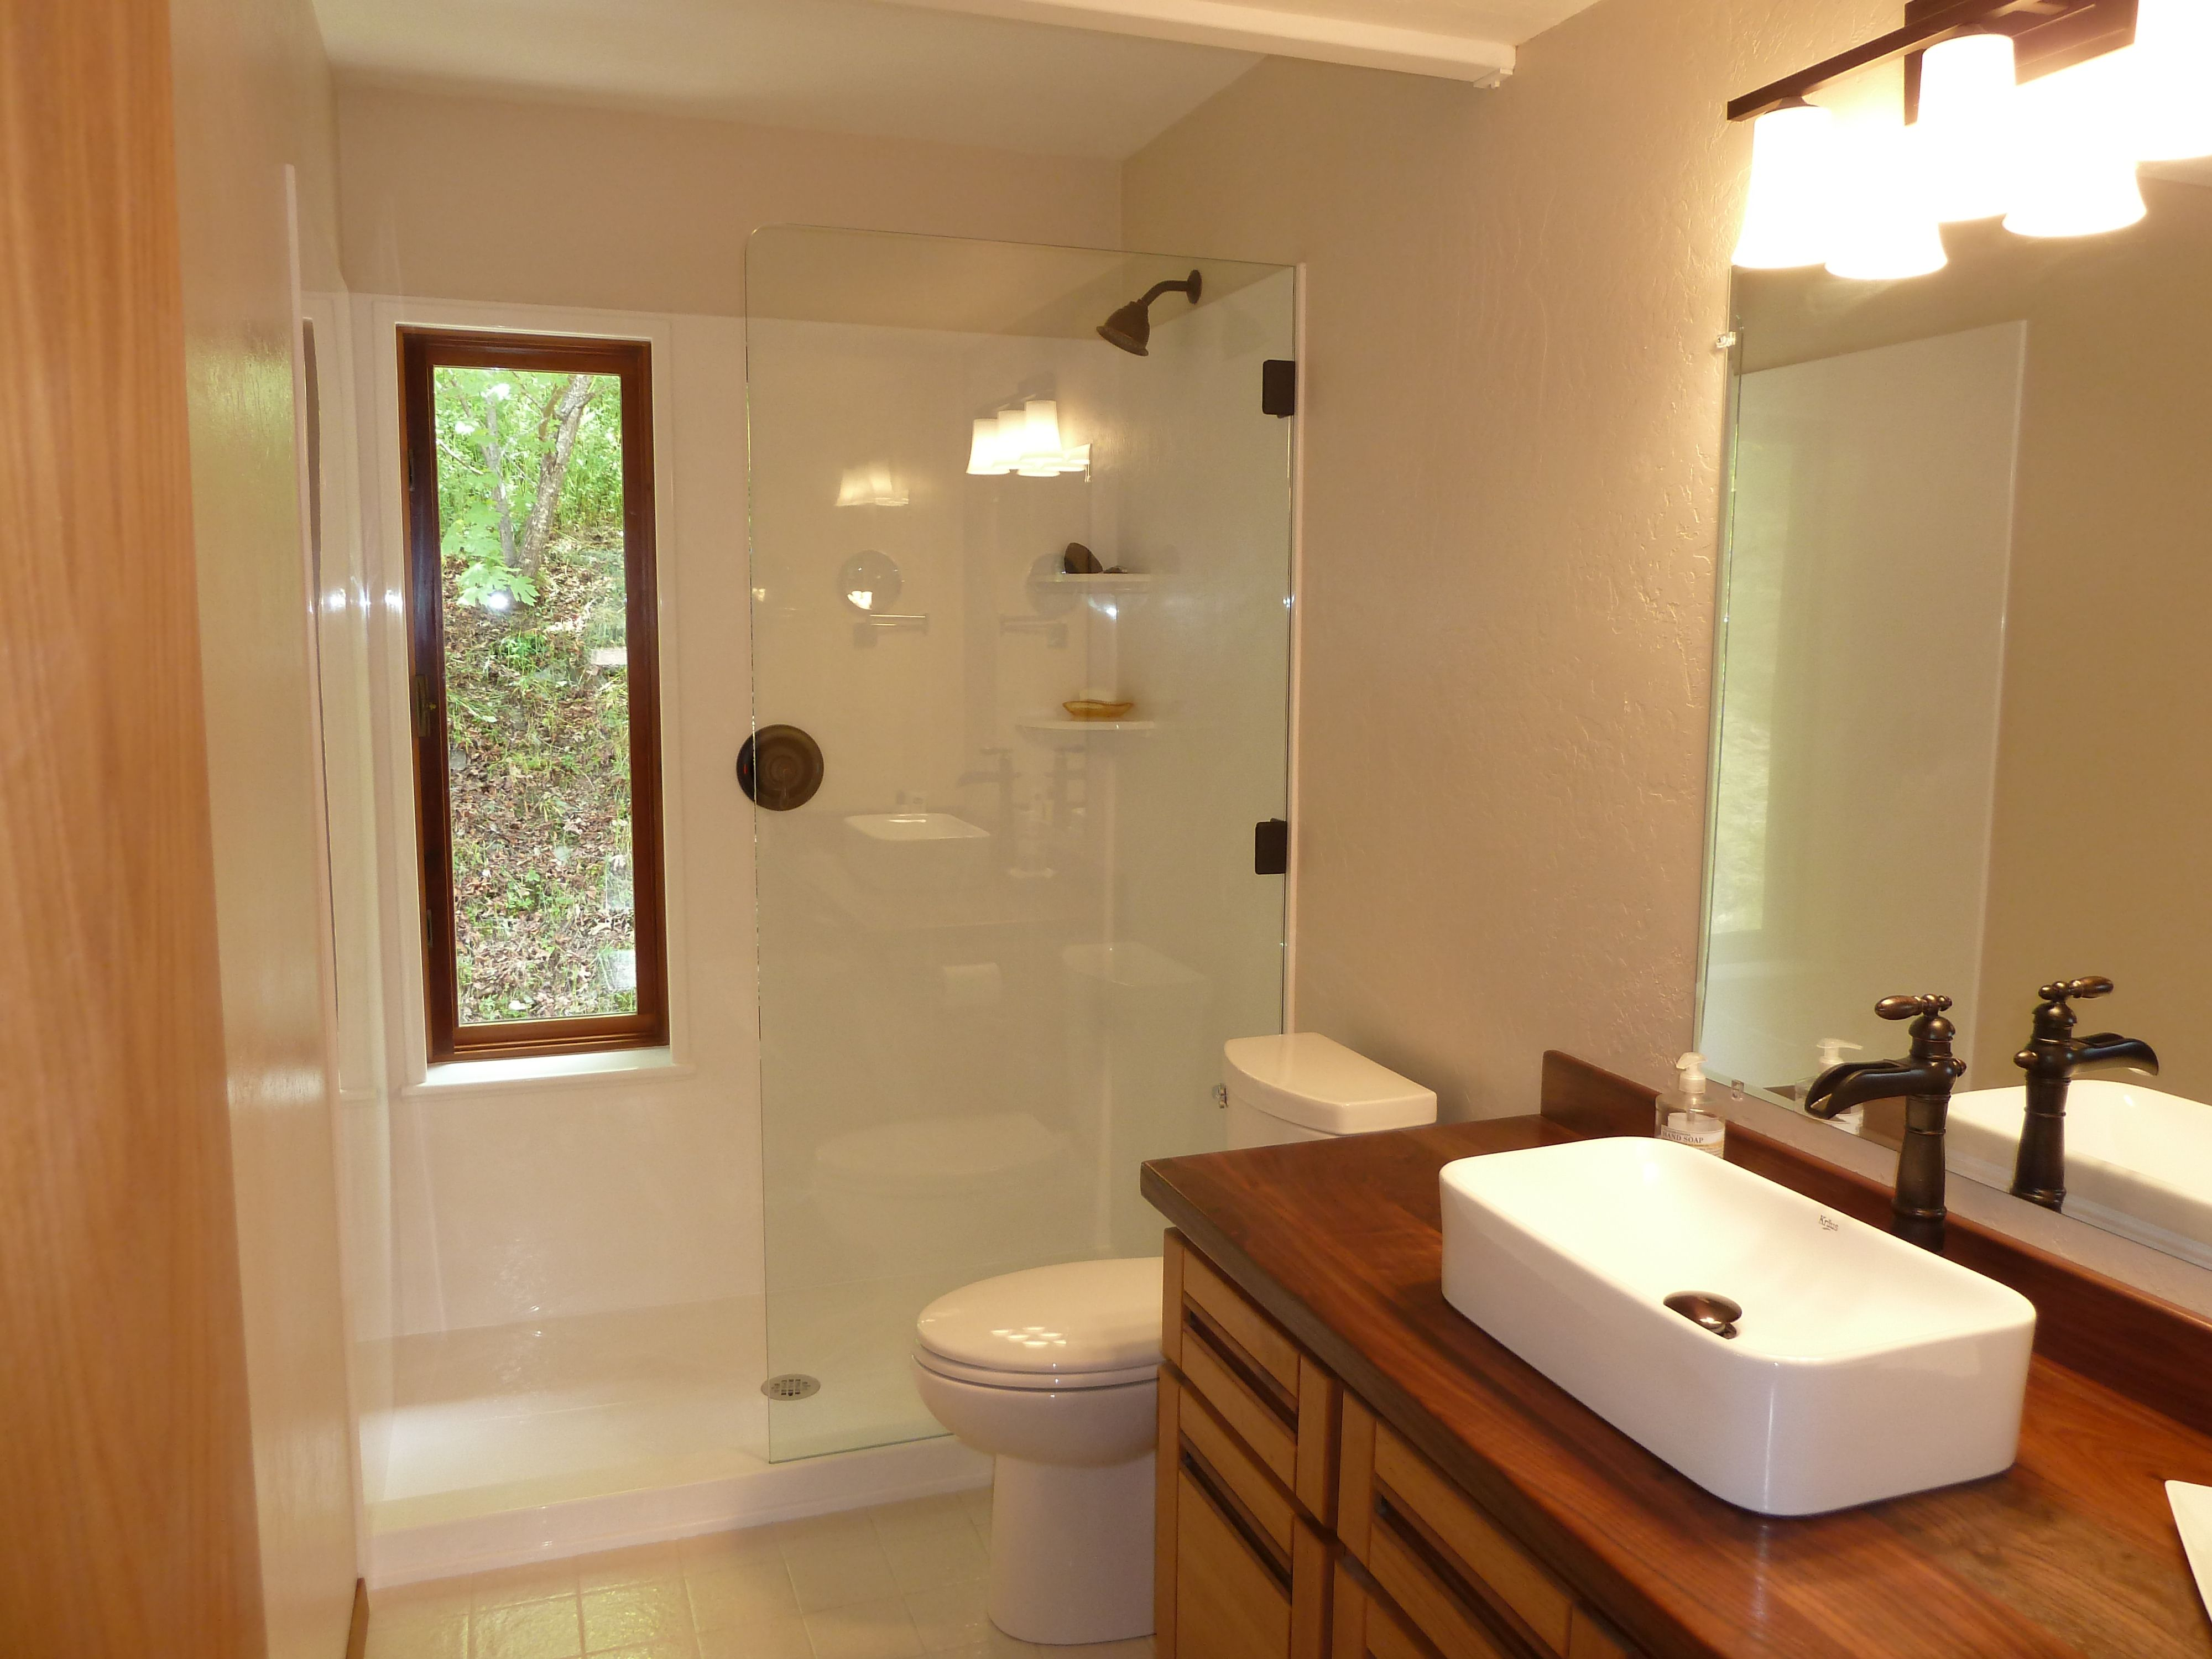 bathroom remodel guest house ideas pinterest